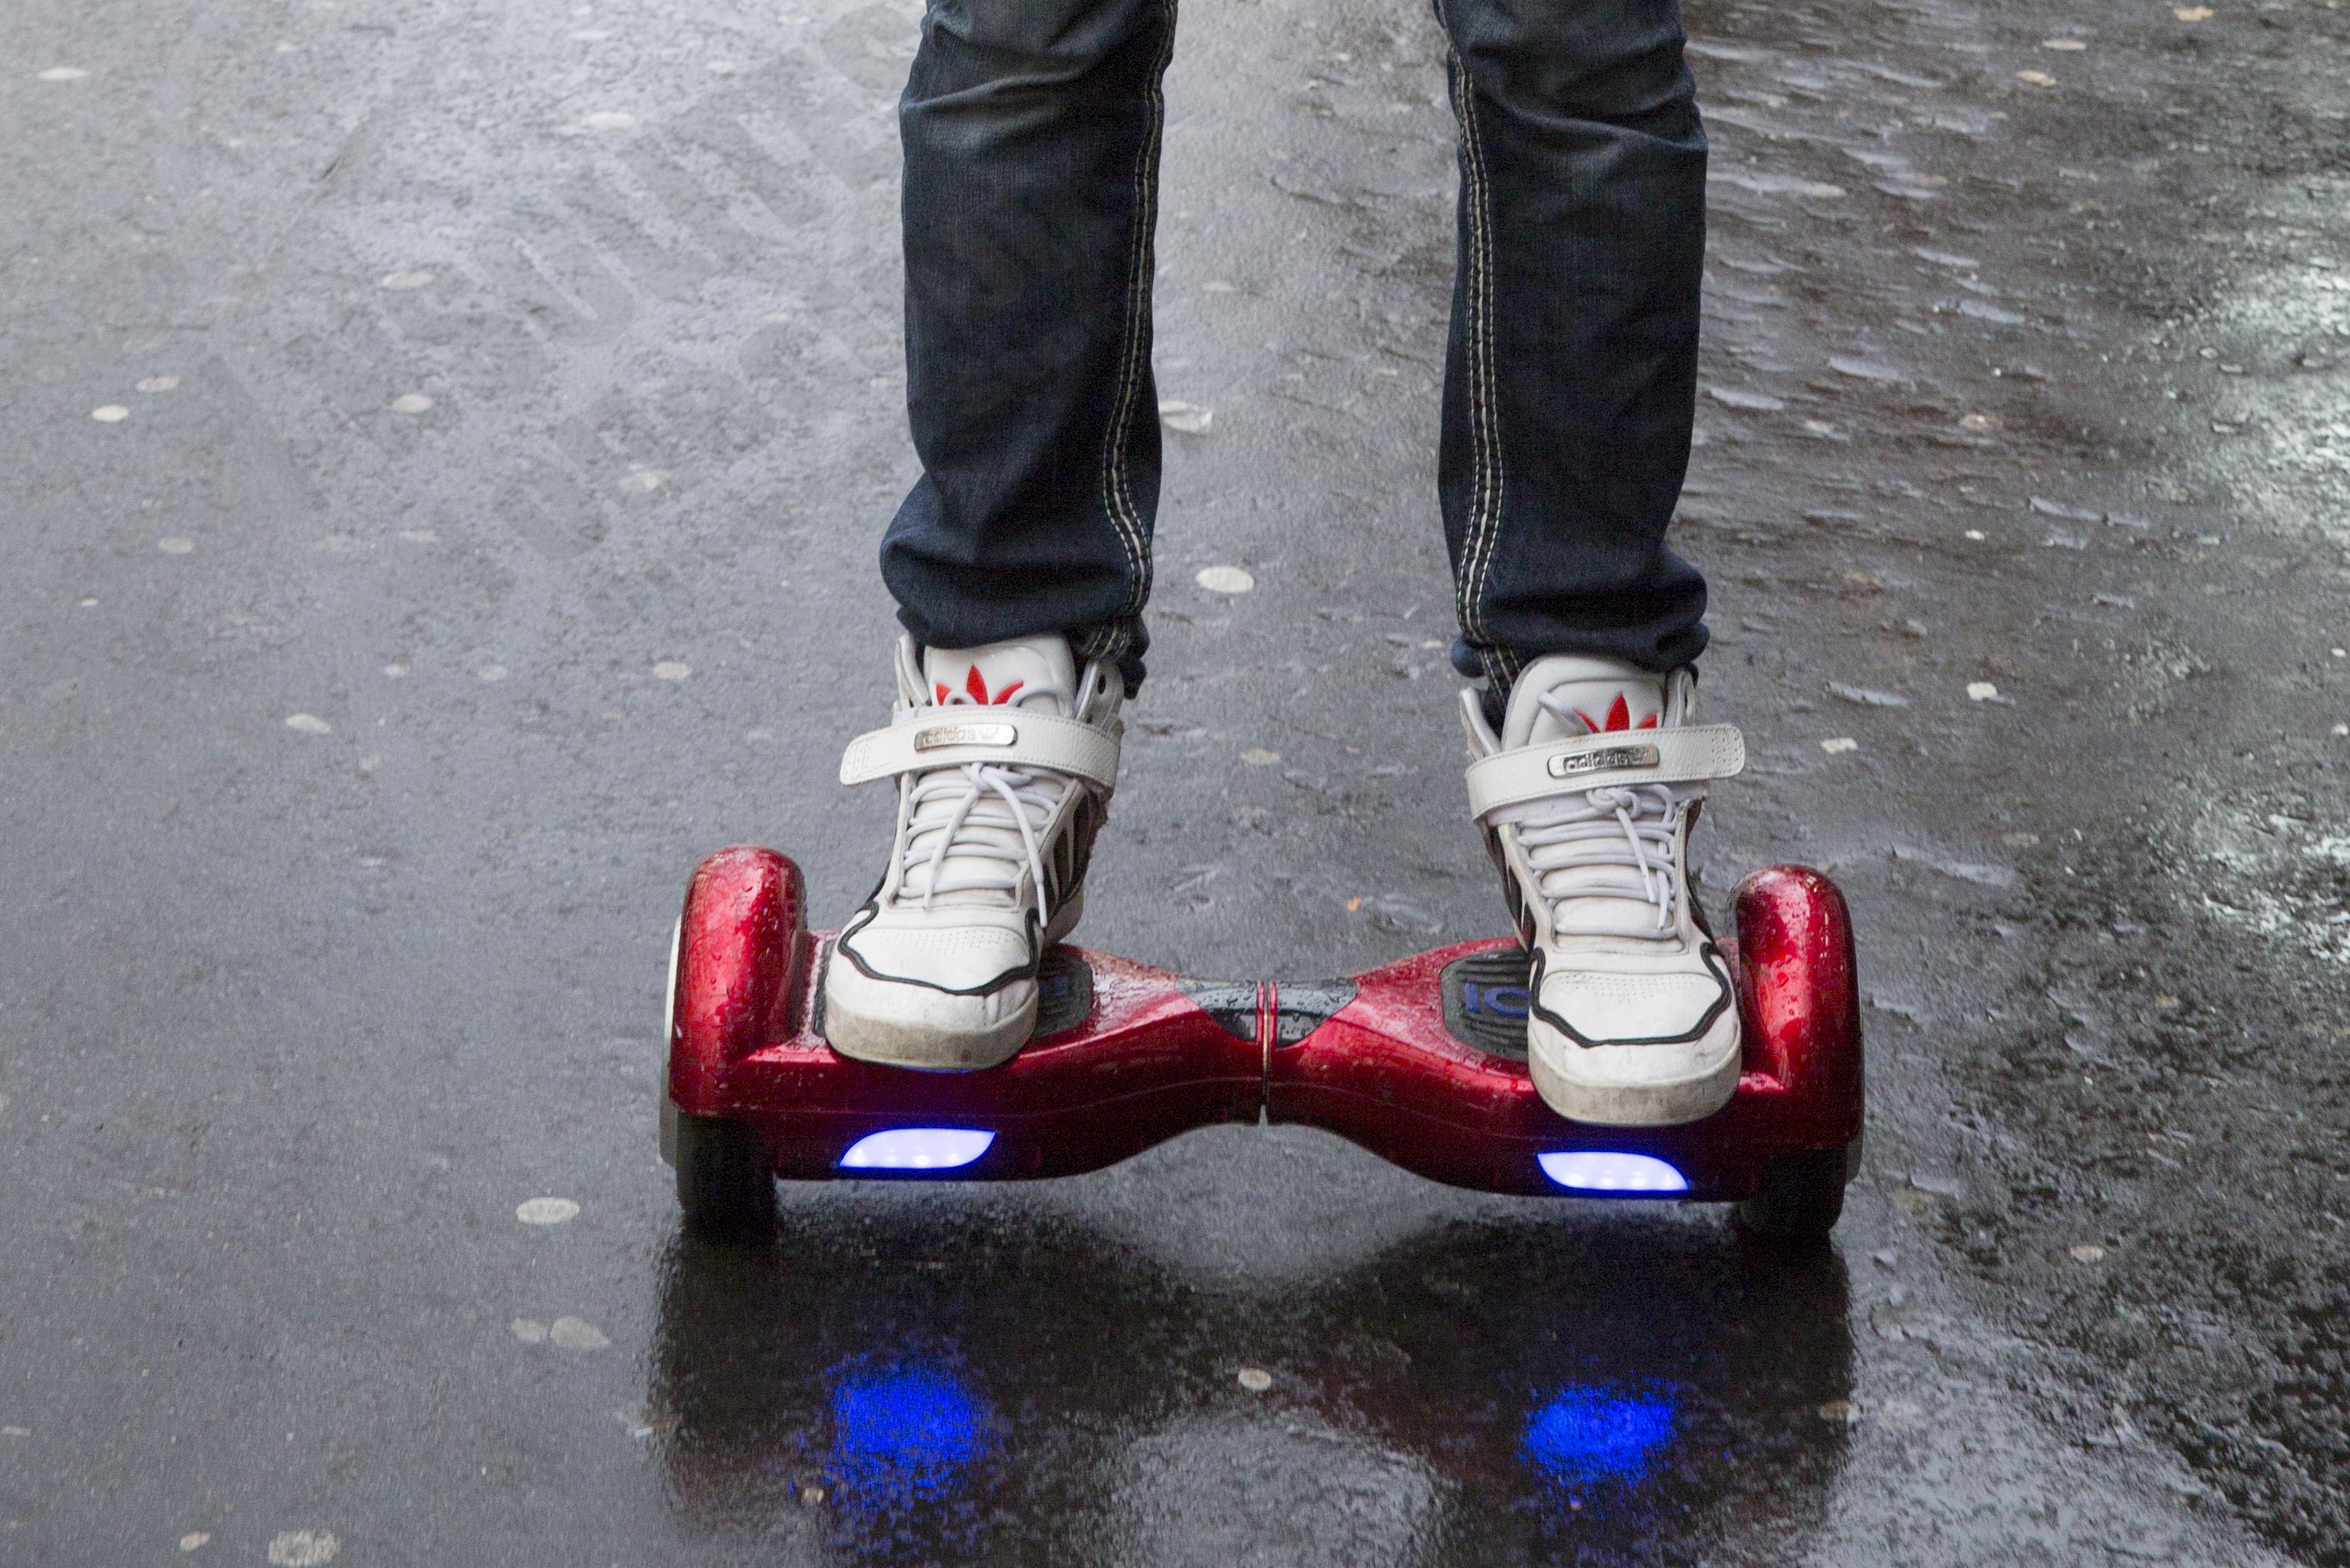 Skateboard gyroscopique: nous avons testé l'Insolites Board